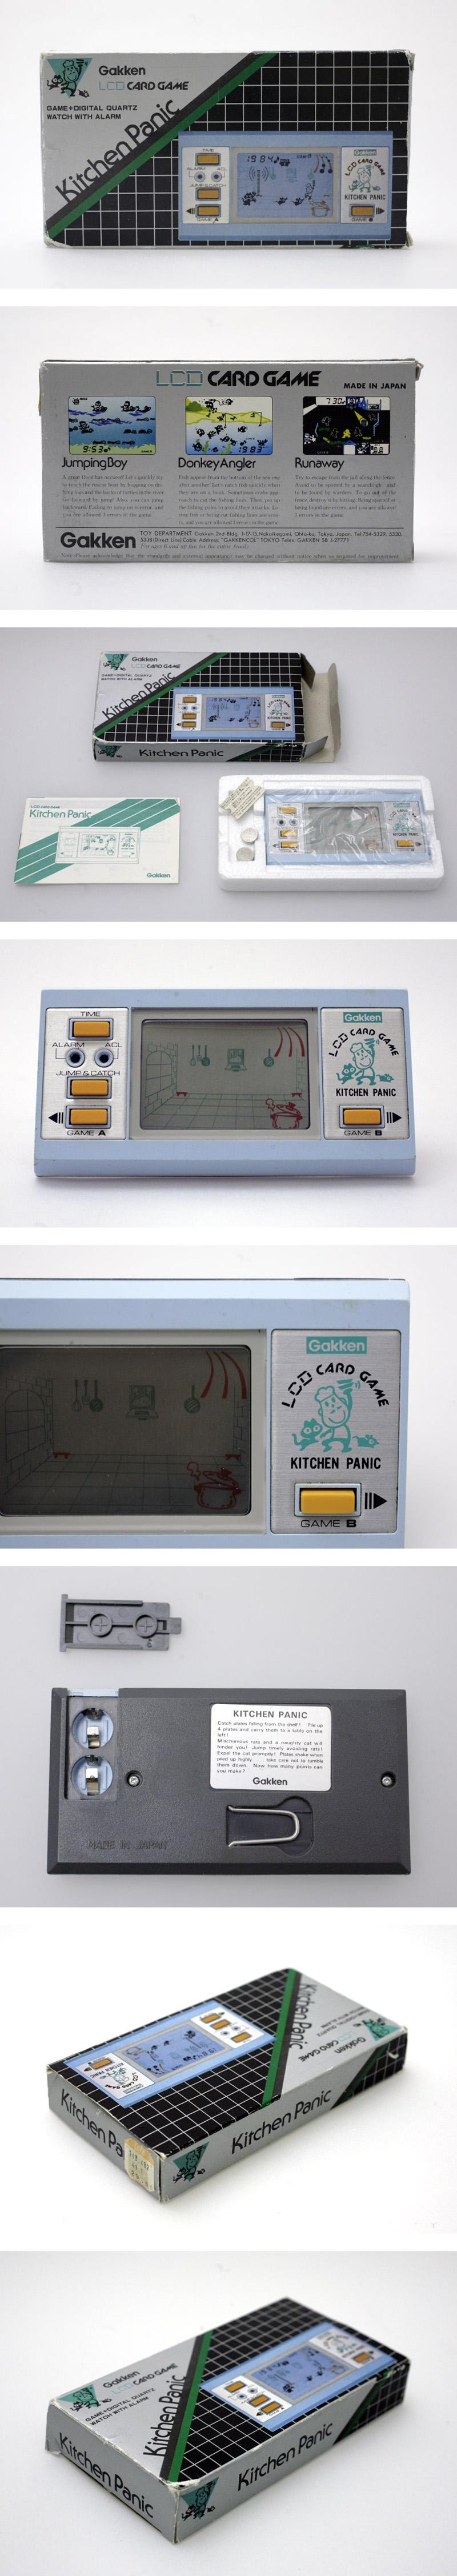 "FOR SALE - ON EBAY.DE, NOW! | GAKKEN ""KITCHEN PANIC"" | 1980's HANDHELD LCD GAME | IN BOX"